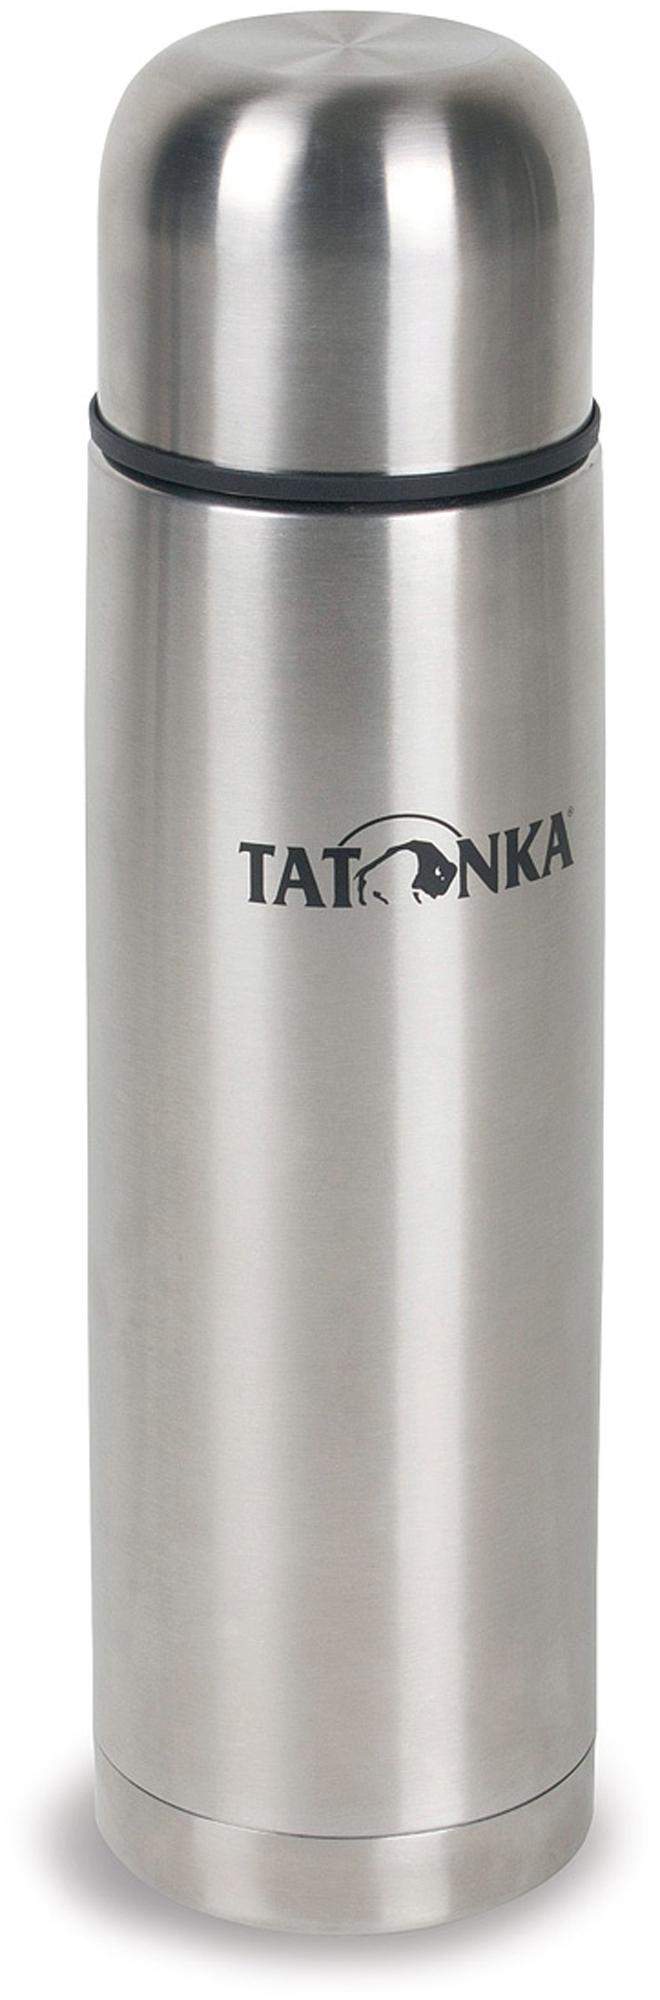 цена на Tatonka Термос Tatonka 1 л